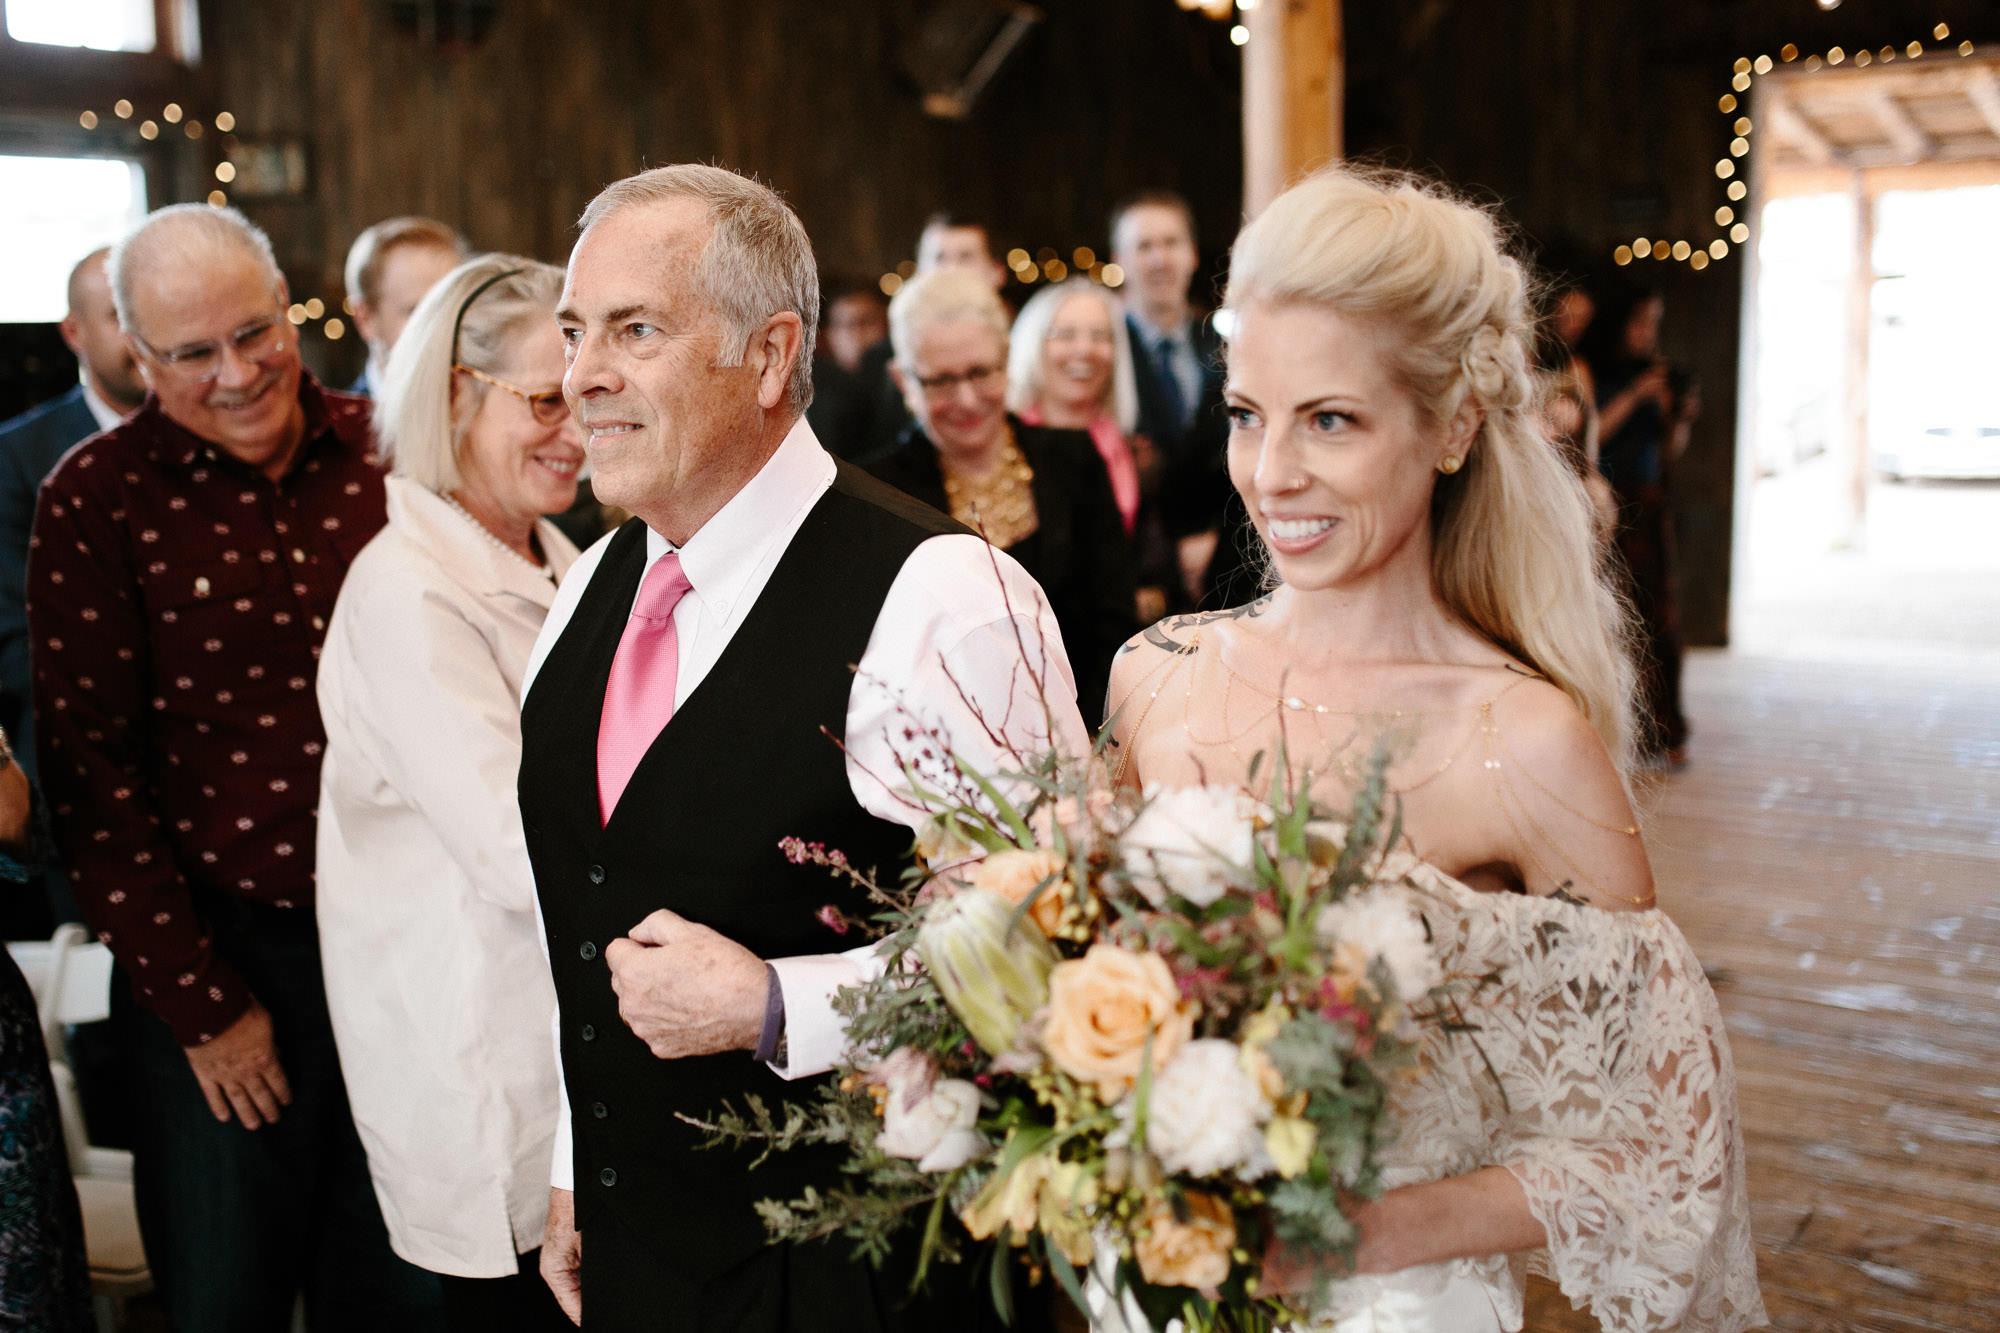 bucci-barn-wedding-elopement-evergreen-boulder-denver-colorado-adventerous-romantic-timeless-059.jpg